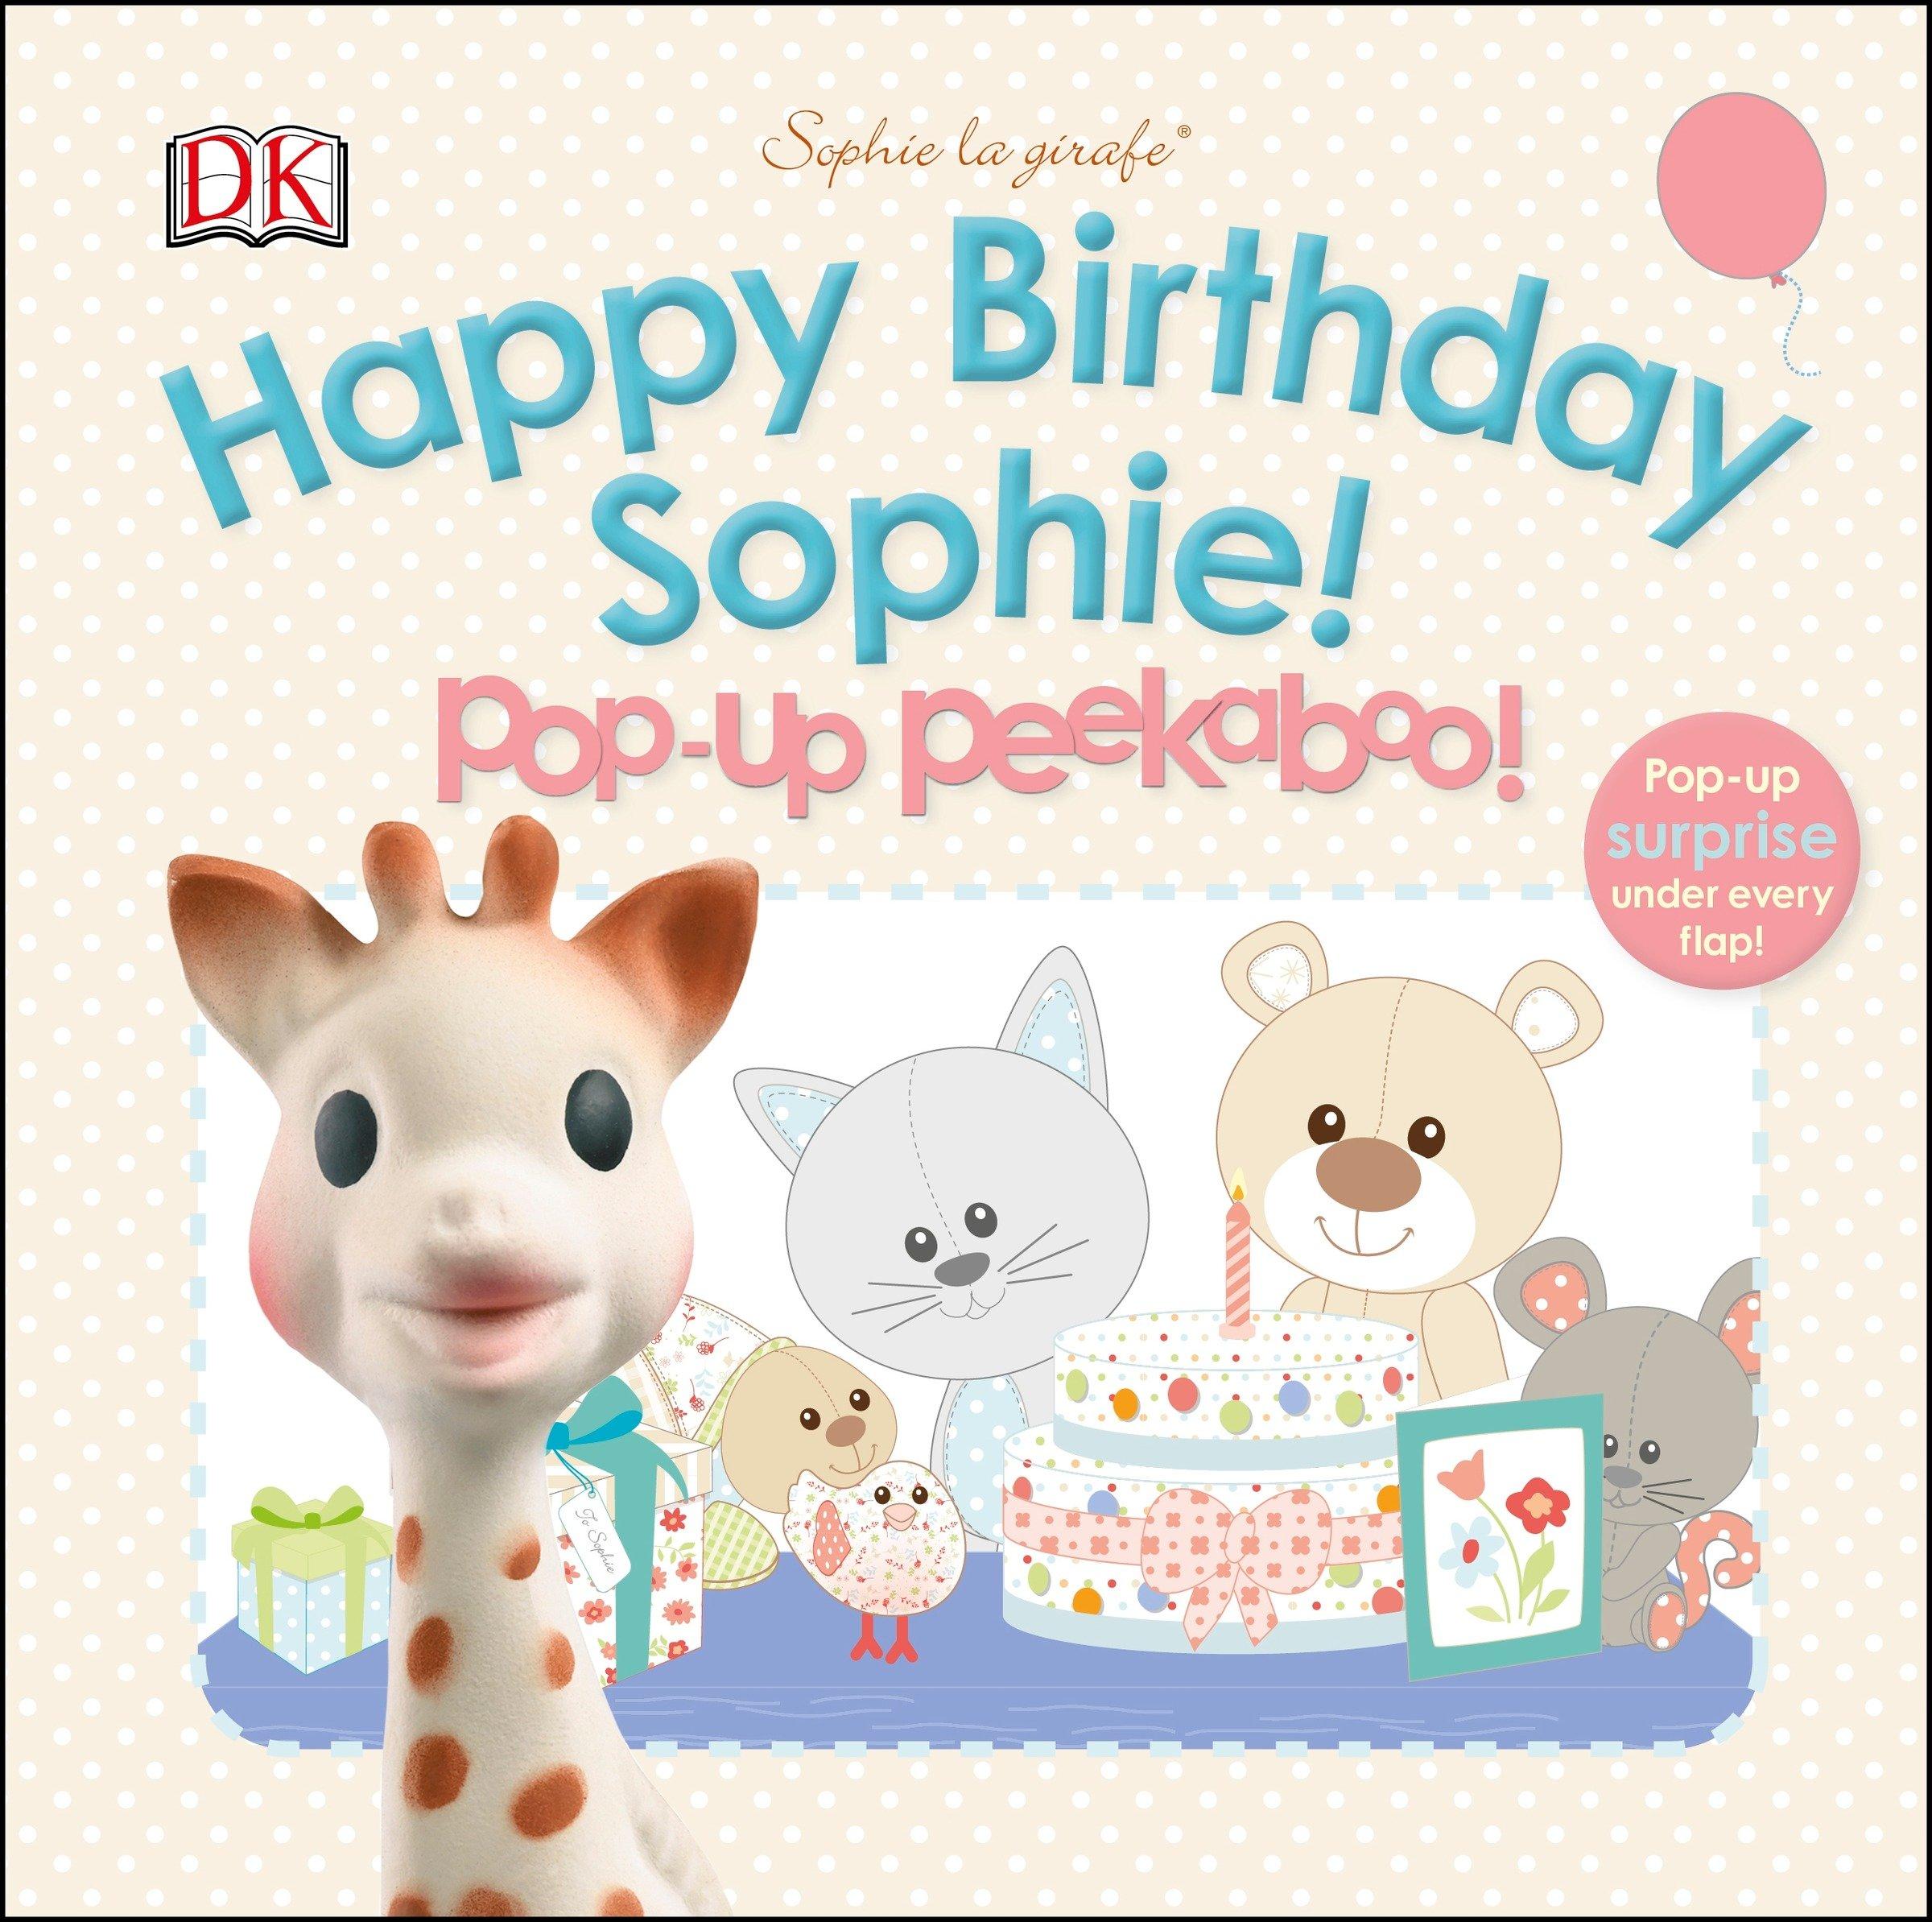 Book Sophie La Girafe: Pop-up Peekaboo Happy Birthday Sophie!: Pop-up Peekaboo! by Dorling Dk